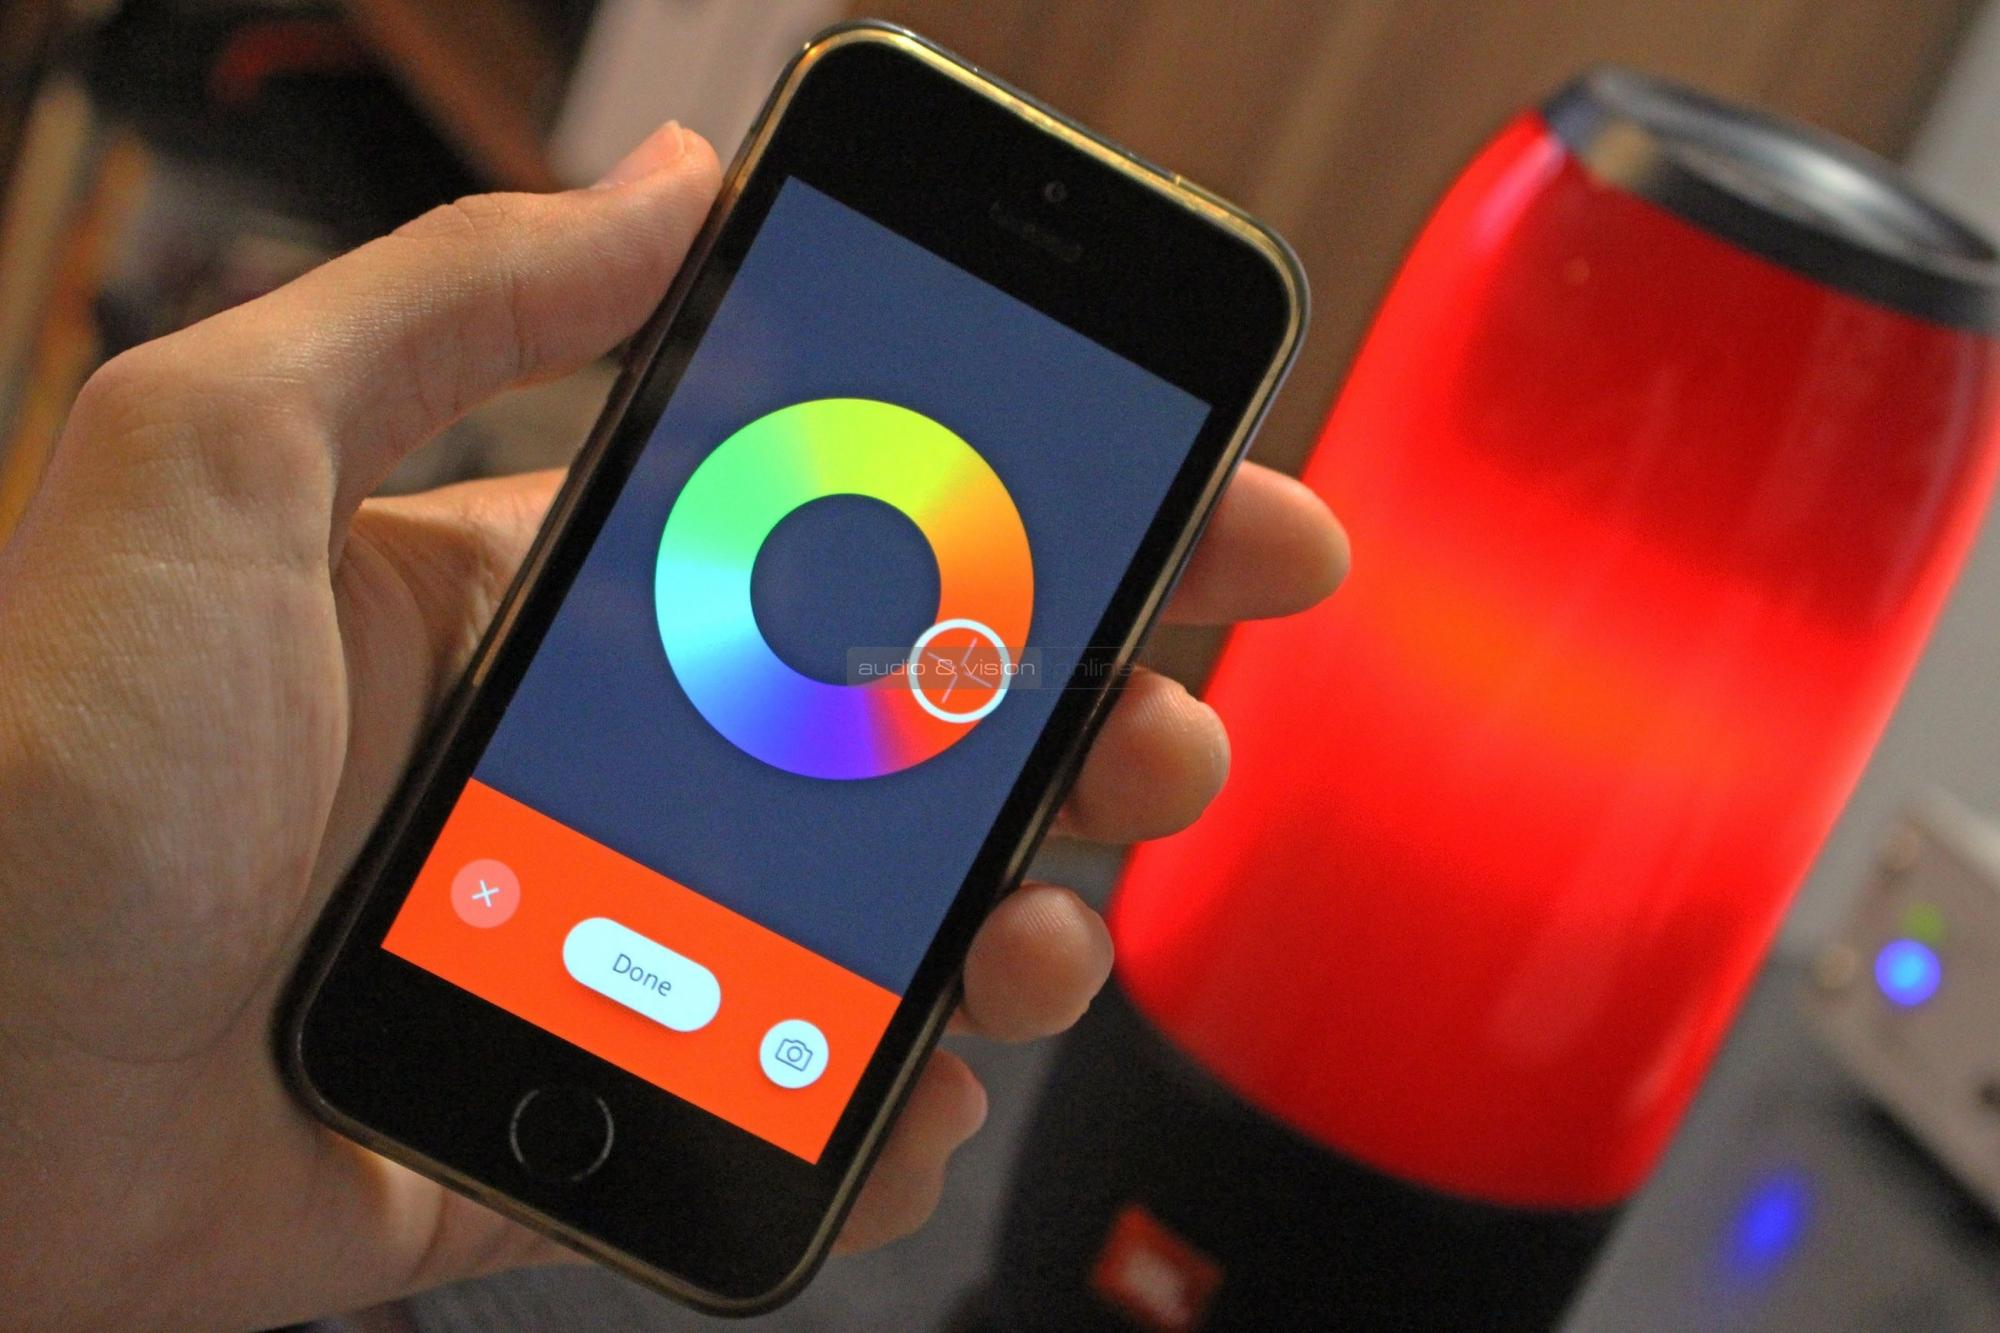 JBL Pulse 3 Bluetooth hangrendszer teszt | av-online hu